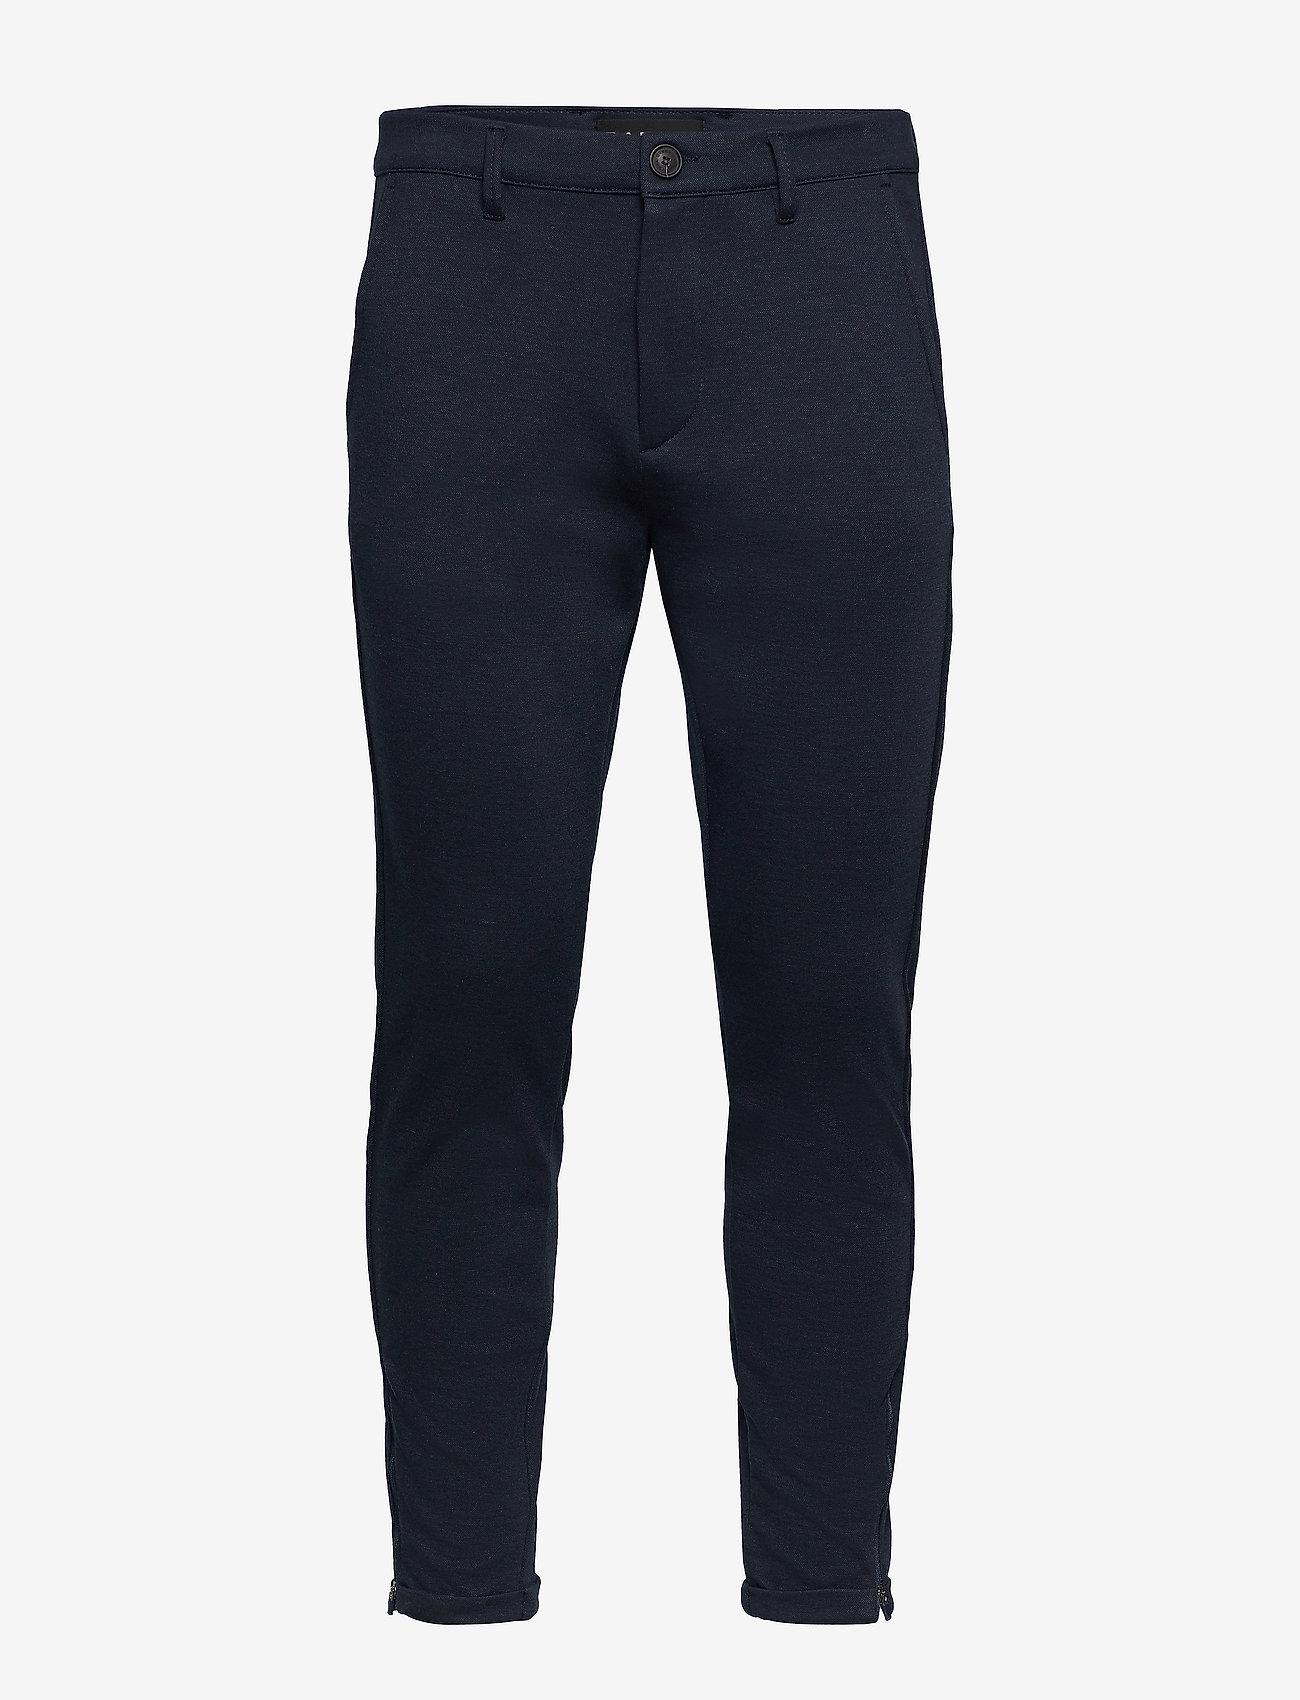 Gabba - Pisa Jersey Pant - chinos - navy - 0